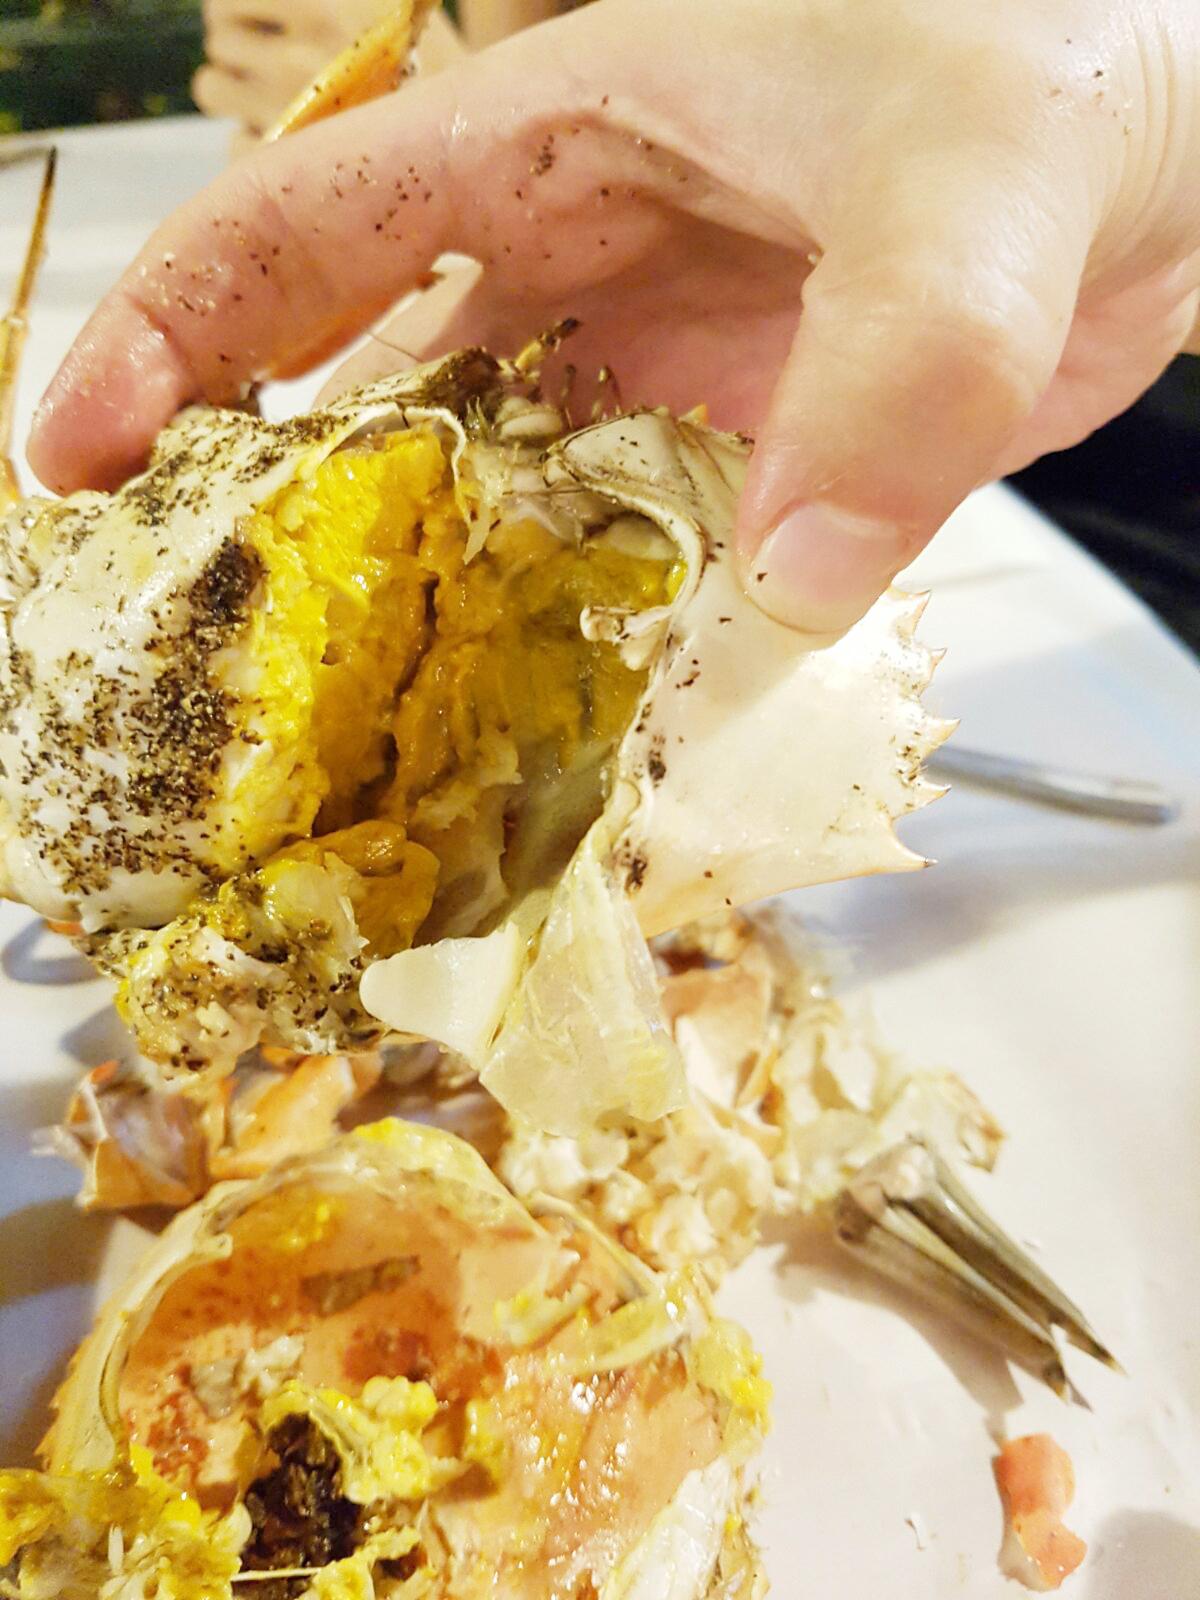 TheBoilerSG_BBQ crab 003